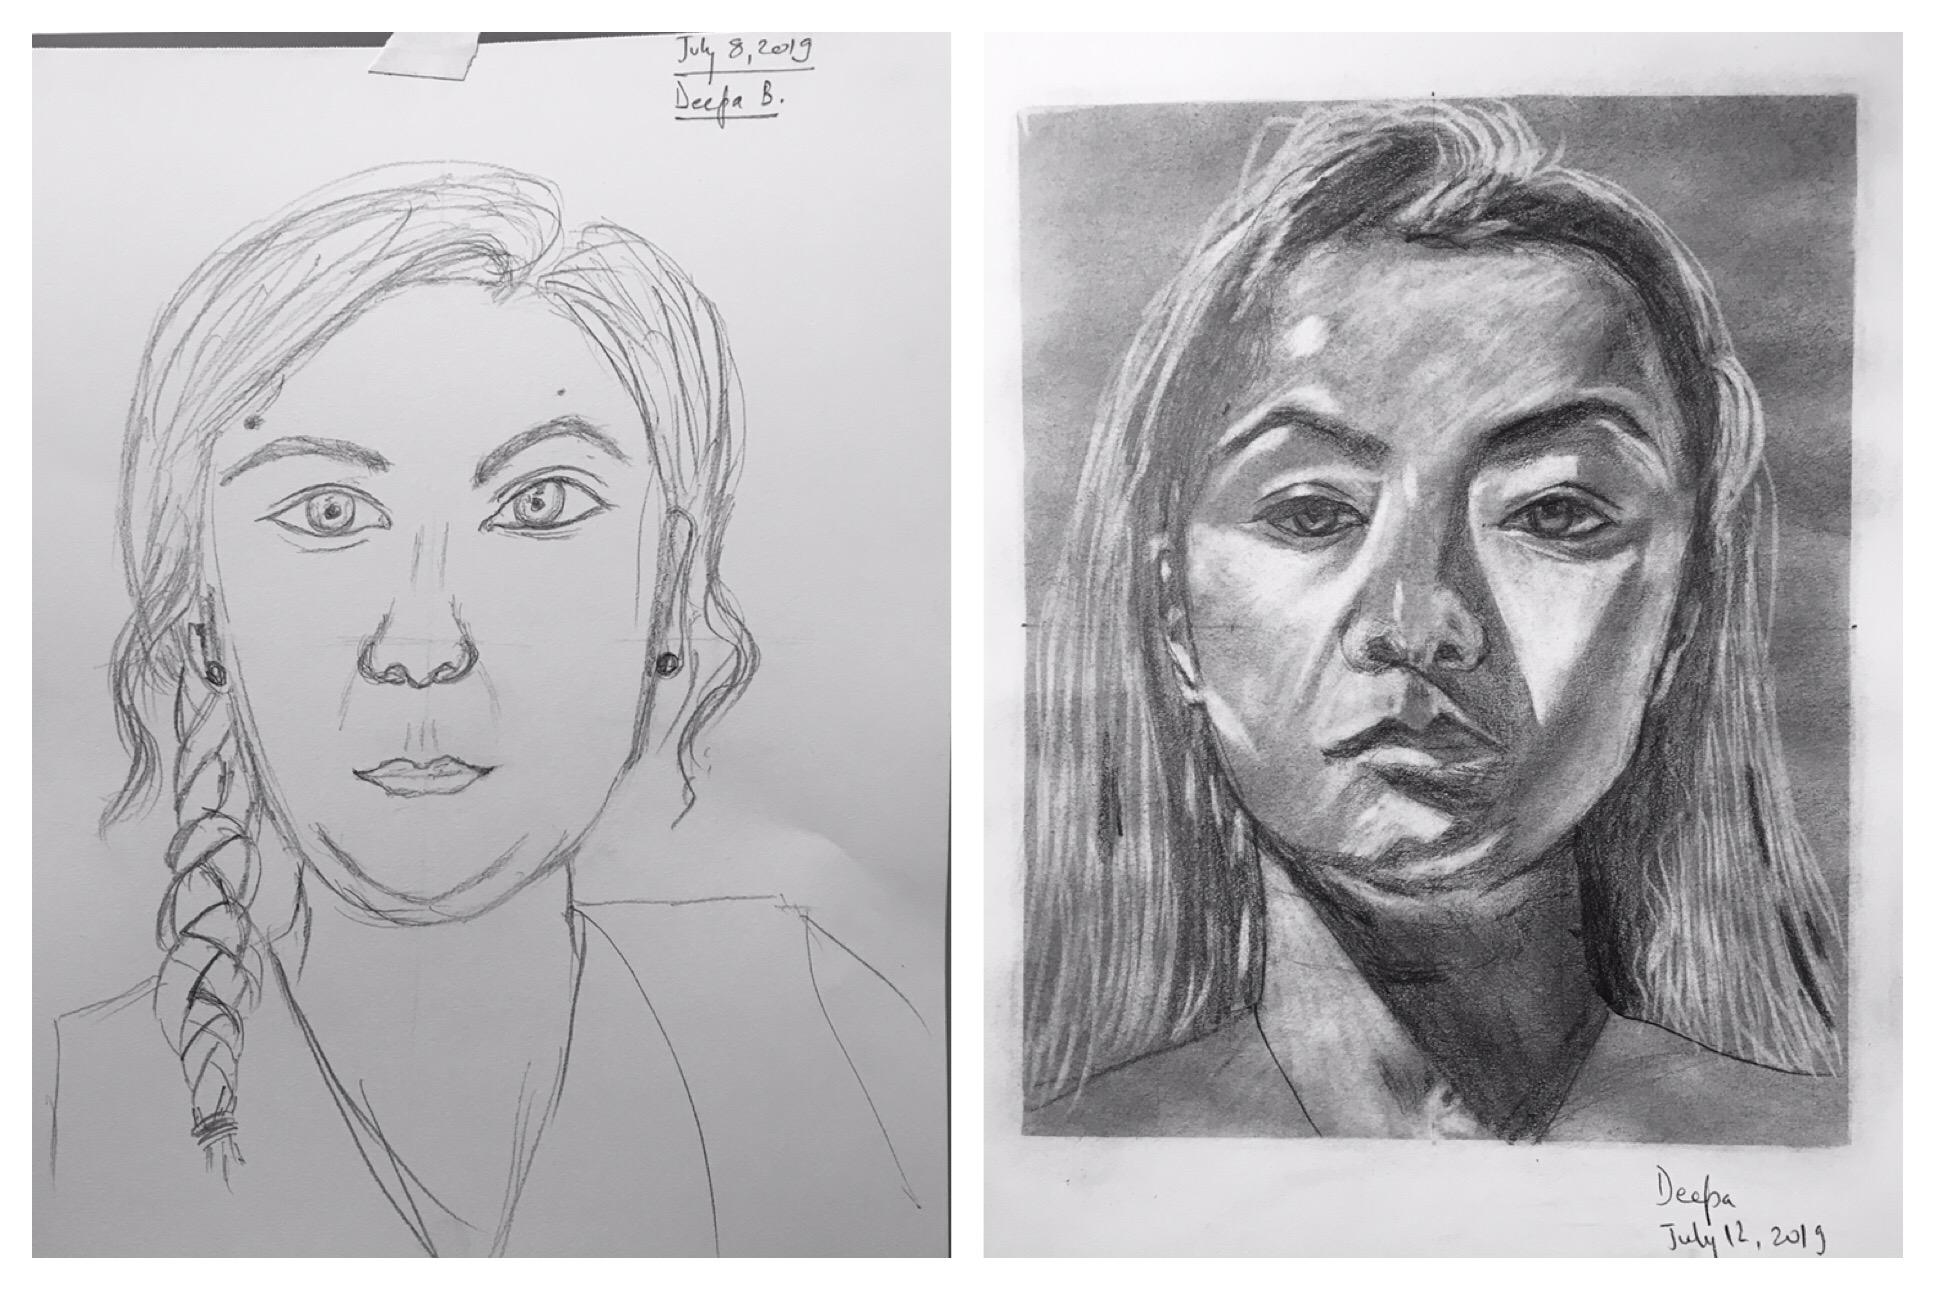 Deepa's Before & After Self Portraits